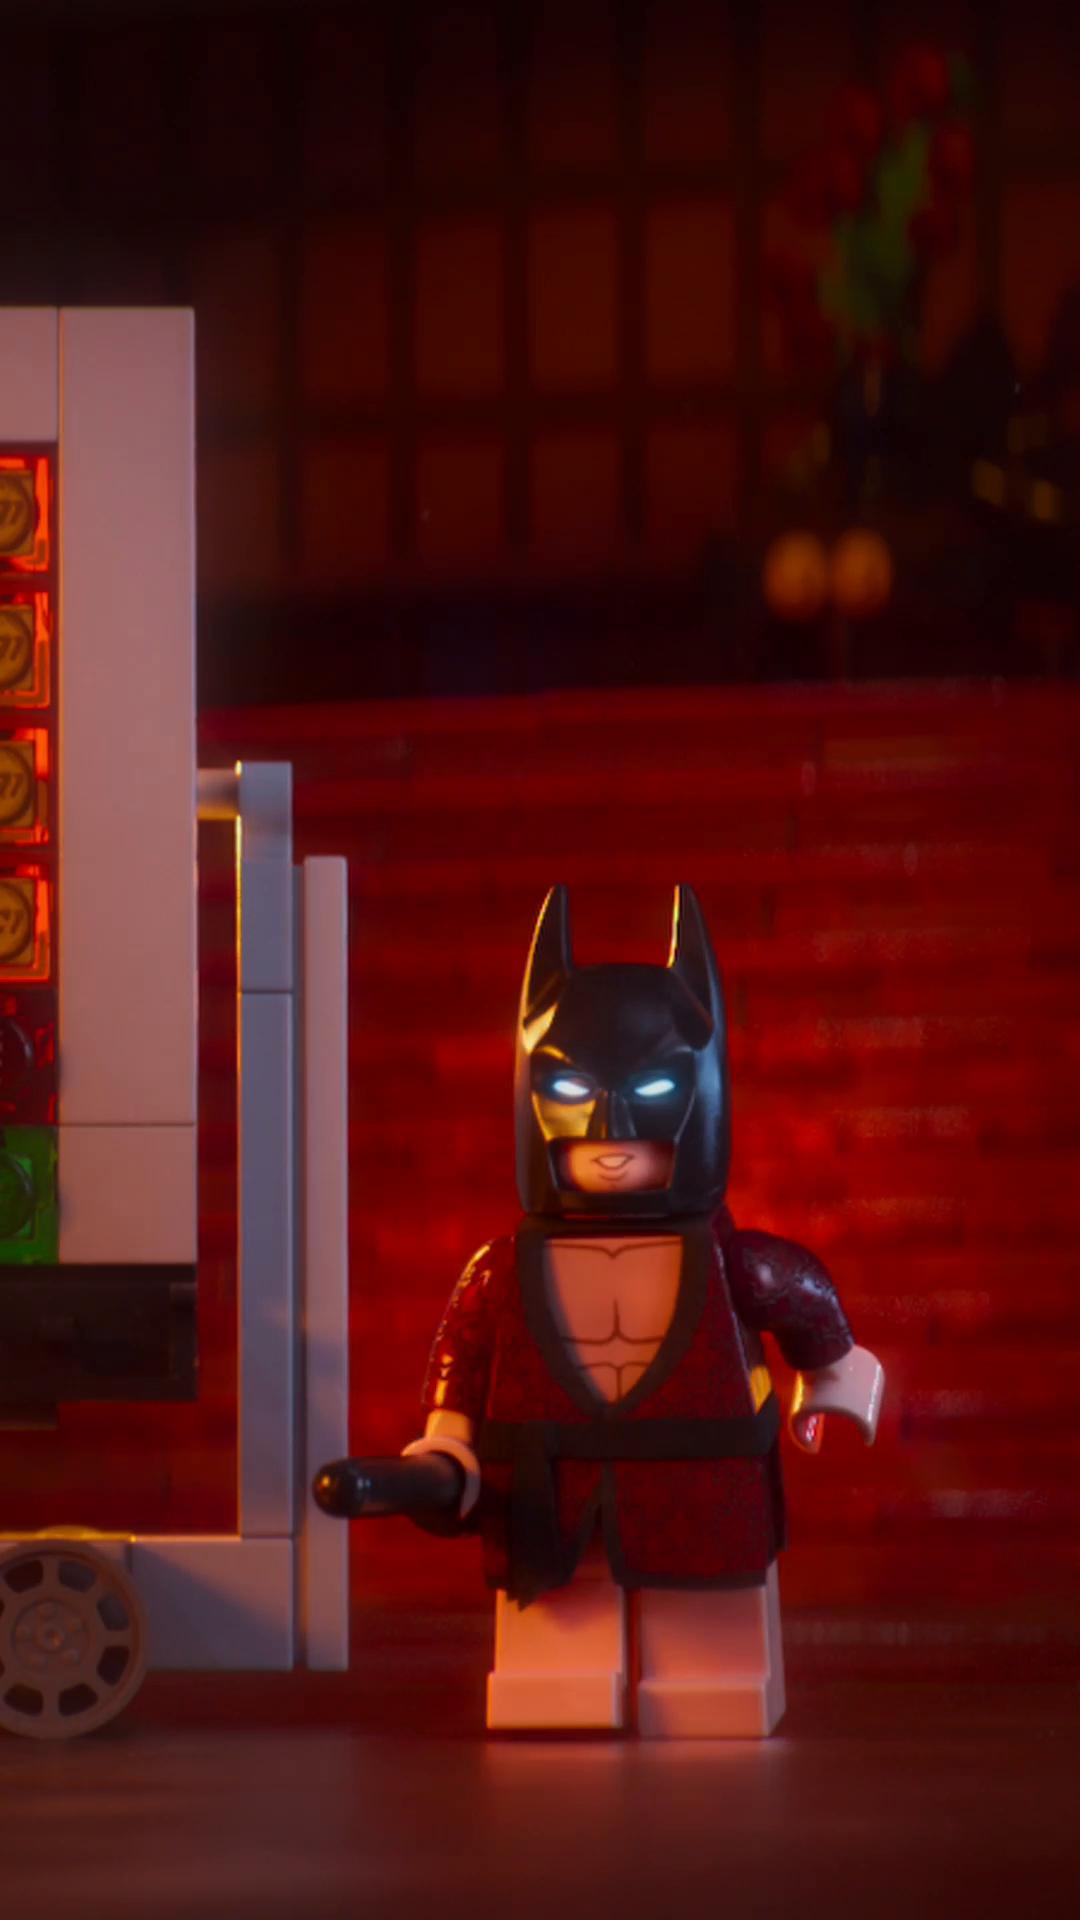 Thumbnail for The LEGO Batman Movie